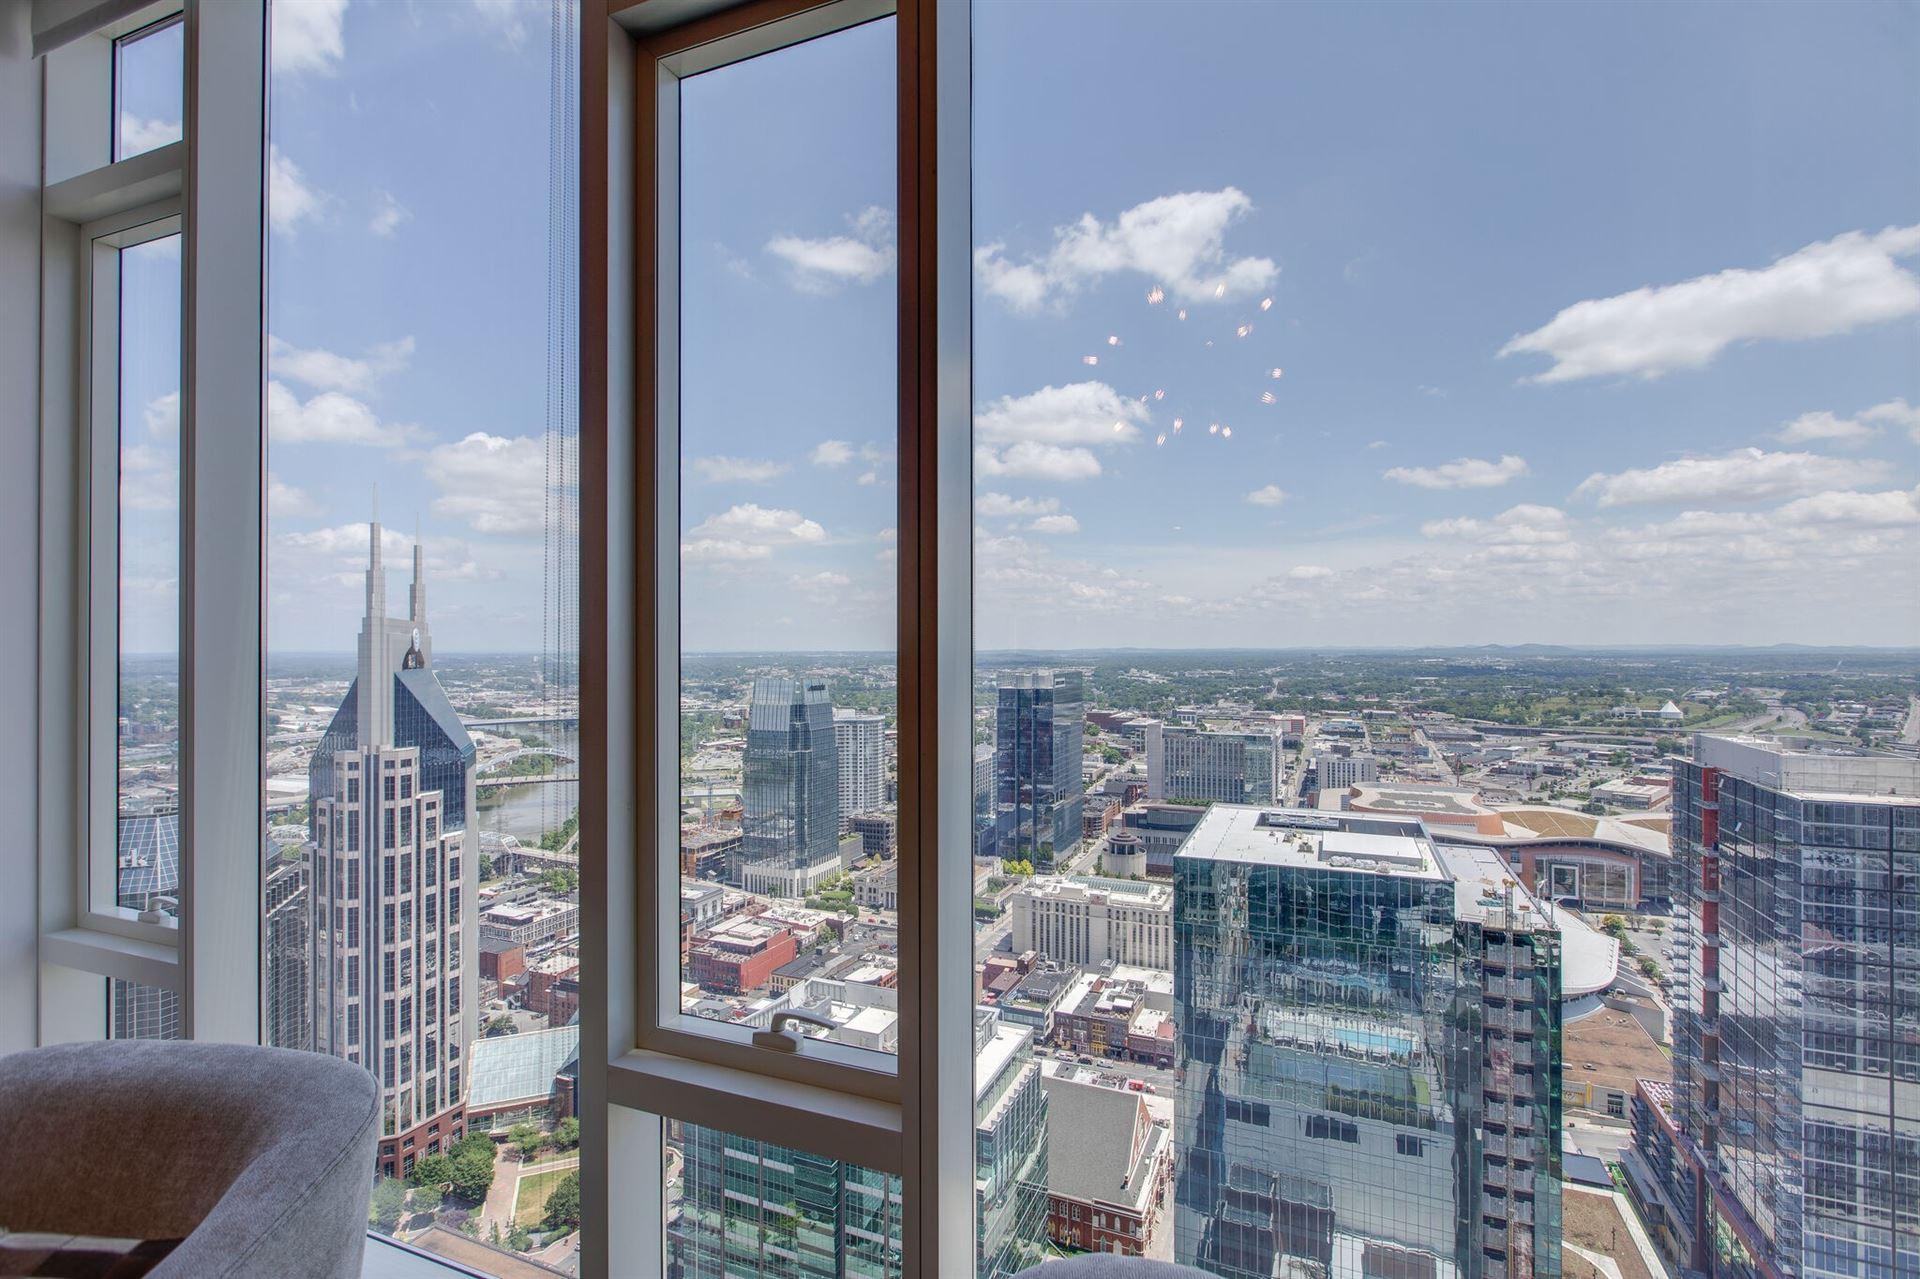 515 Church St #3806, Nashville, TN 37219 - MLS#: 2292134